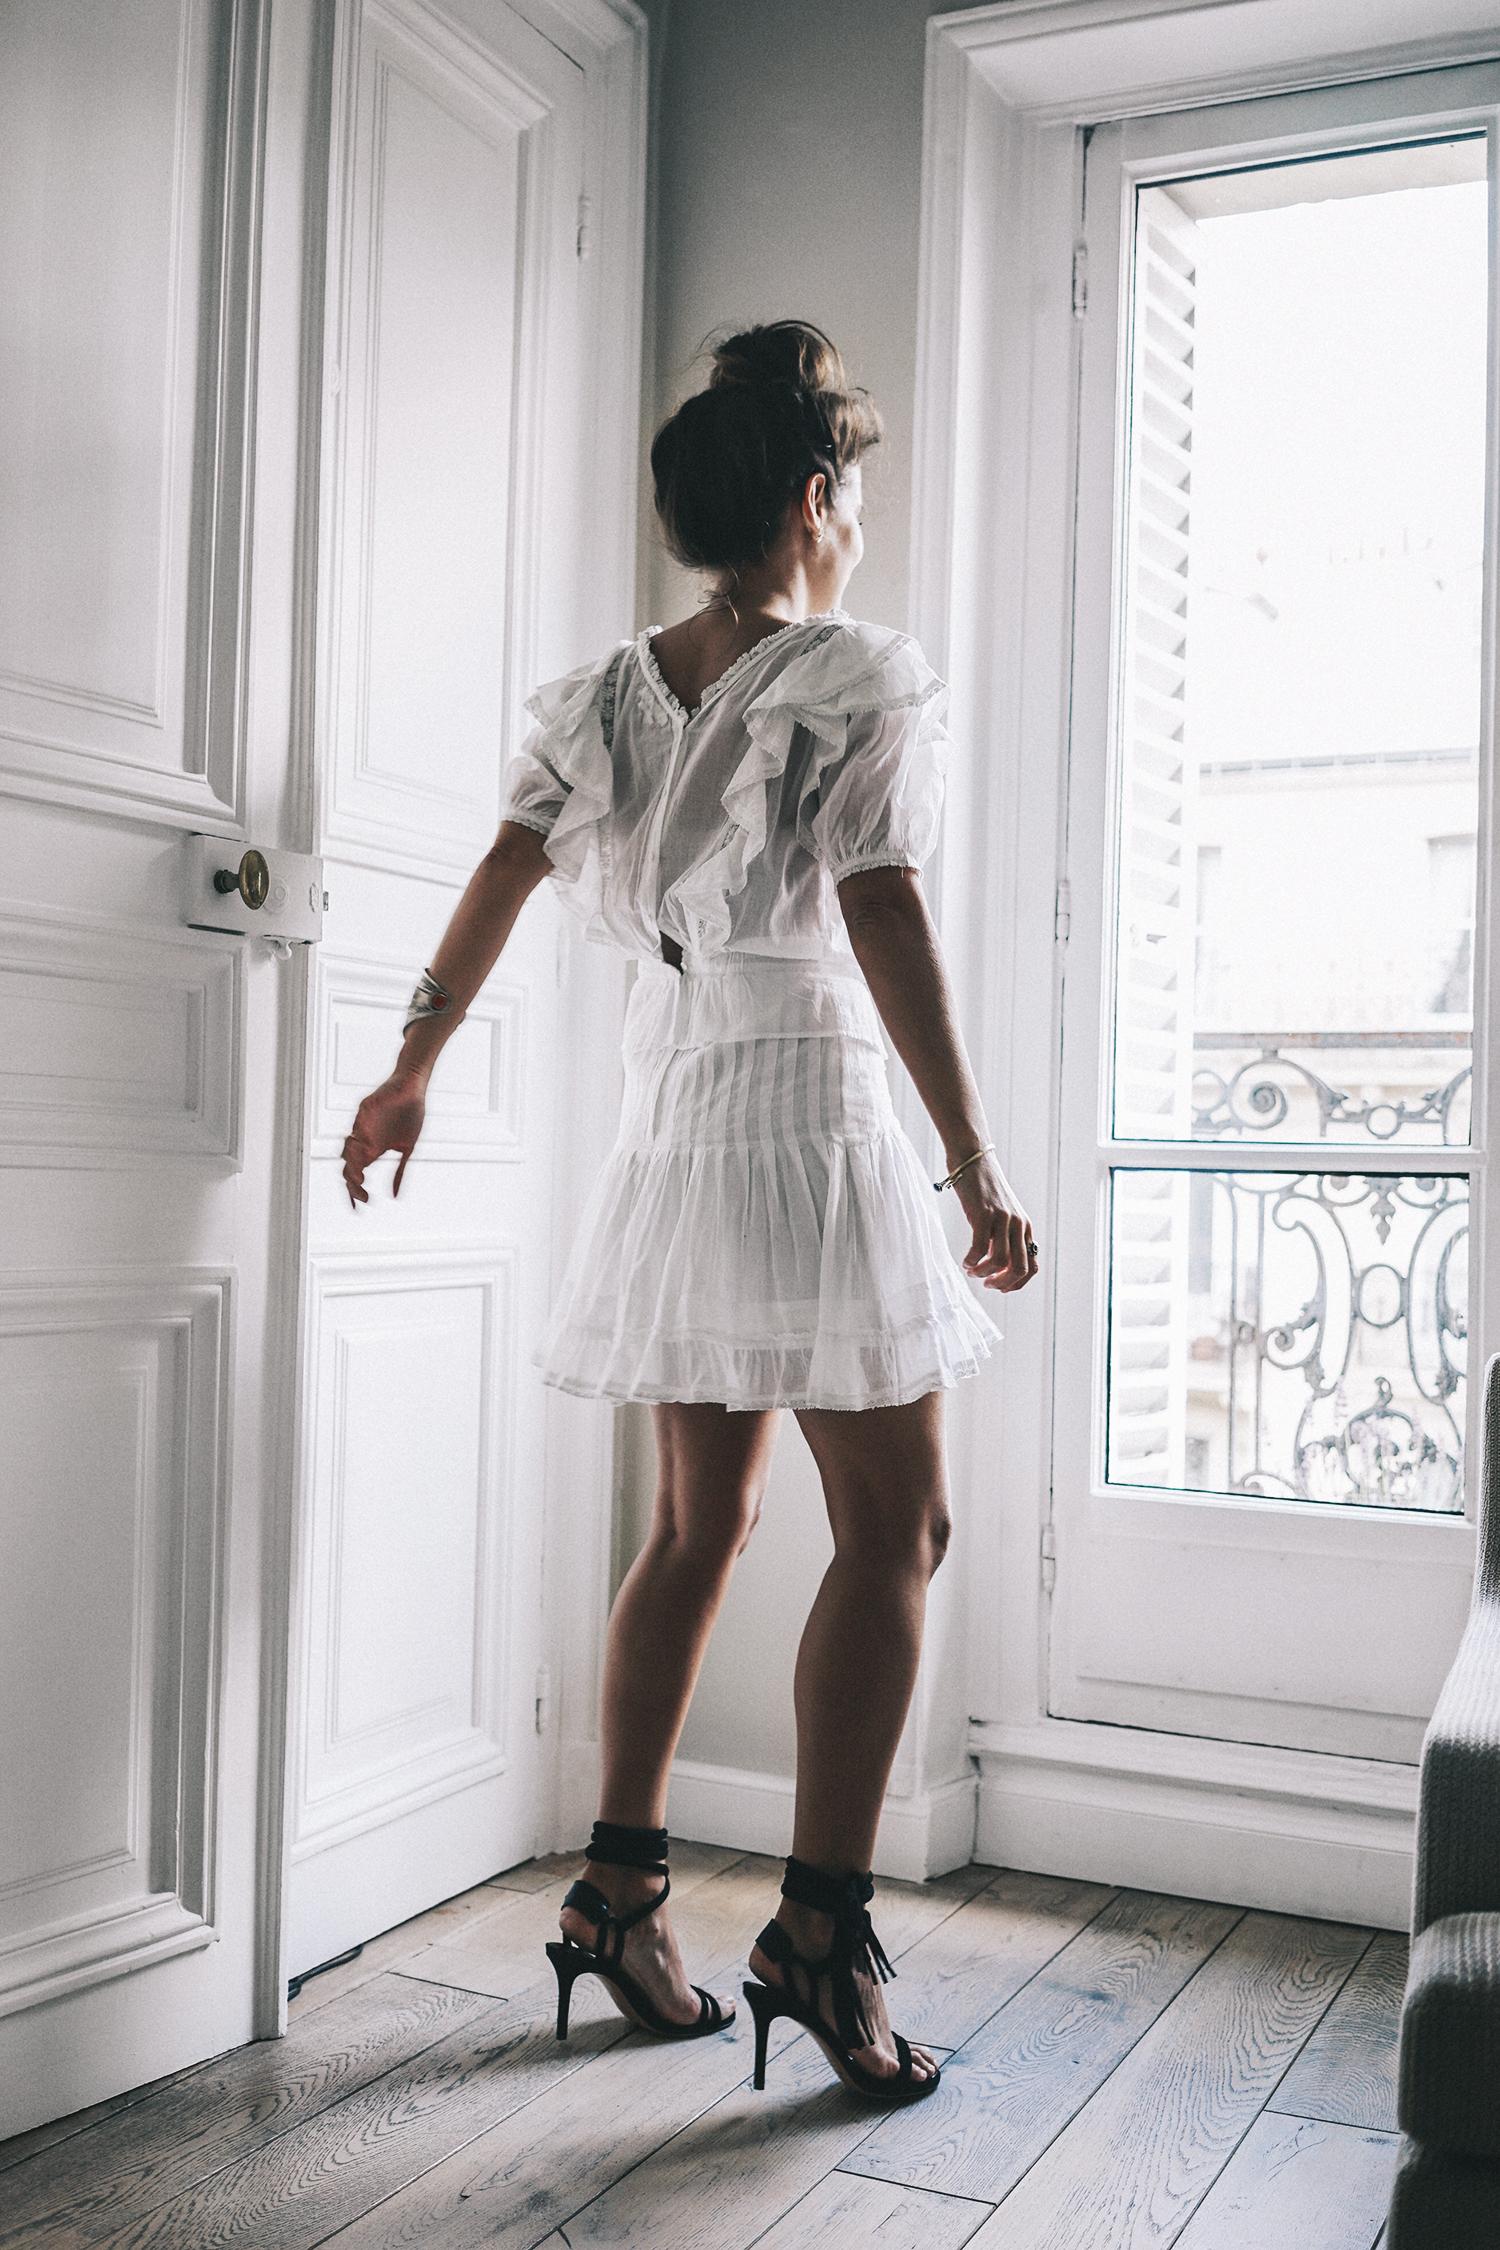 Home_Away-Isabel_Marant_Dress-Outfit-Paris-Collage_Vintage-43